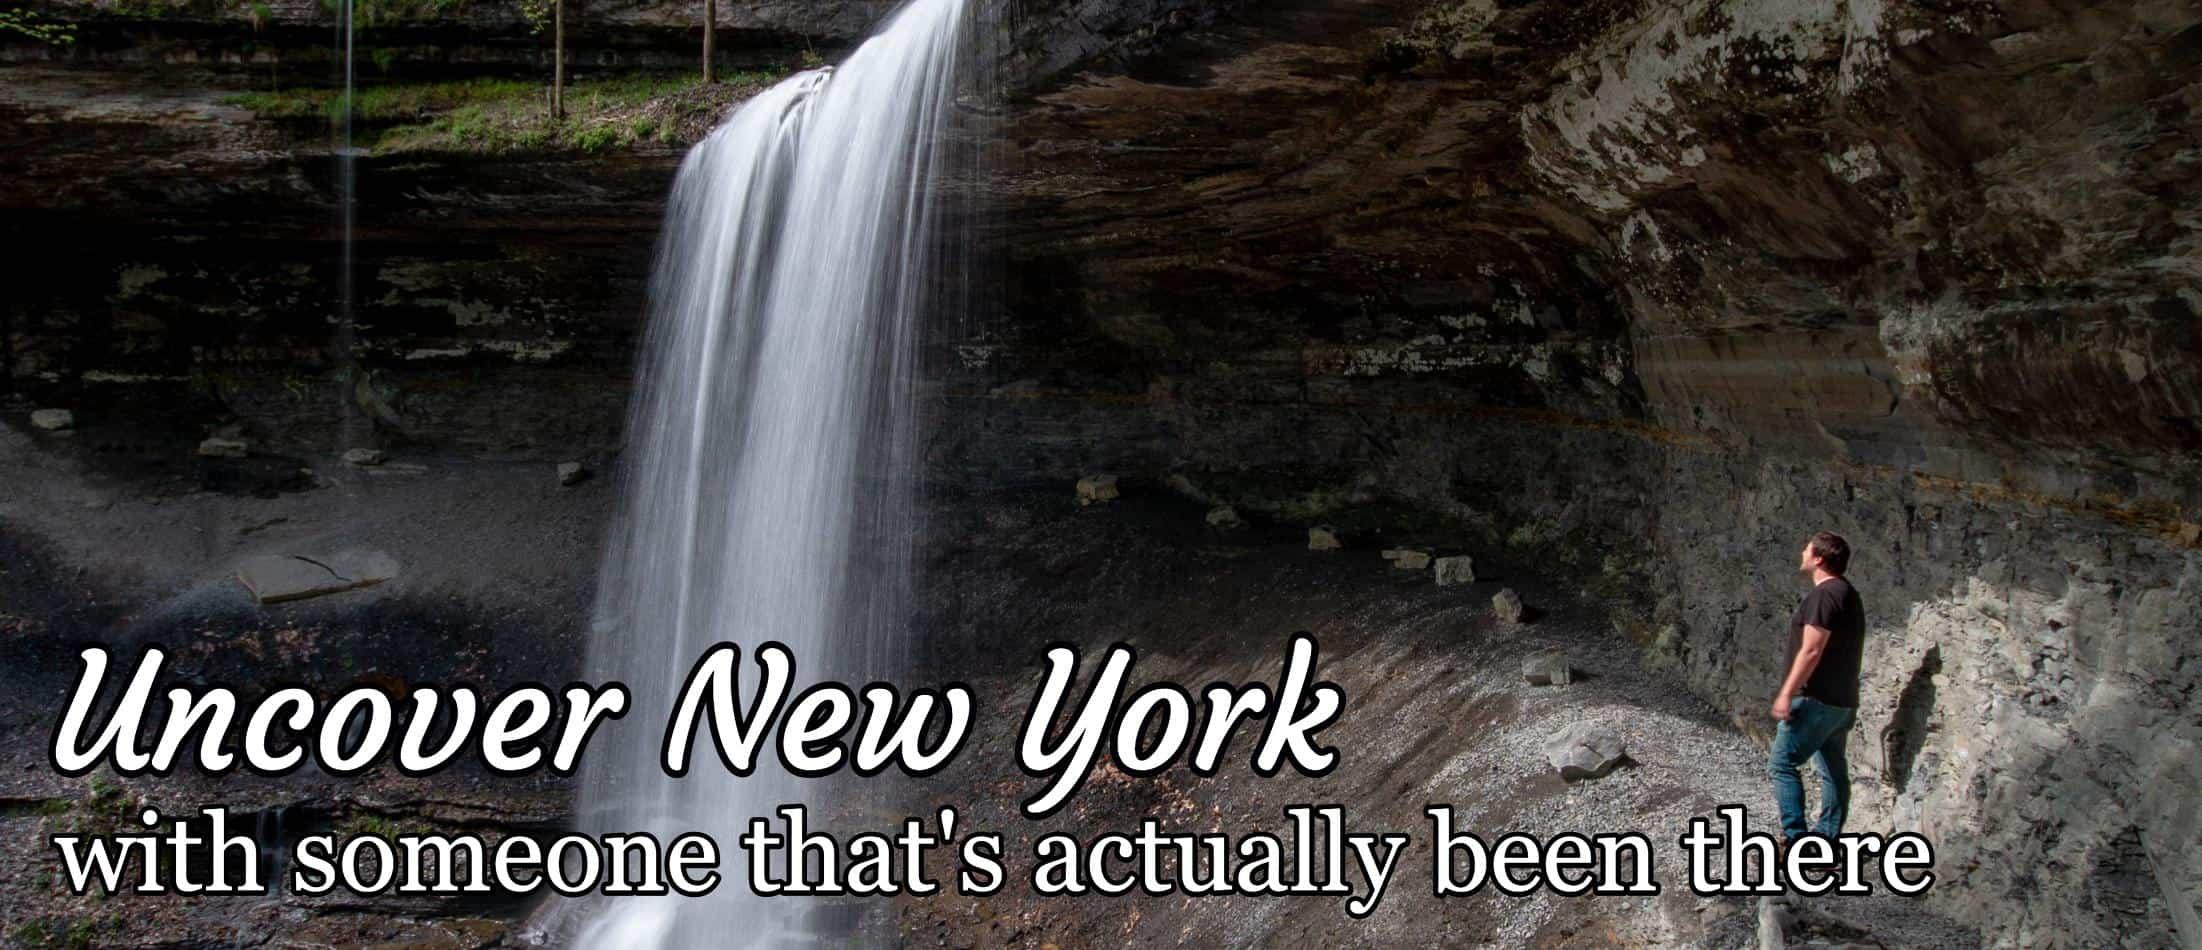 New York Travel Blog - Uncovering New York